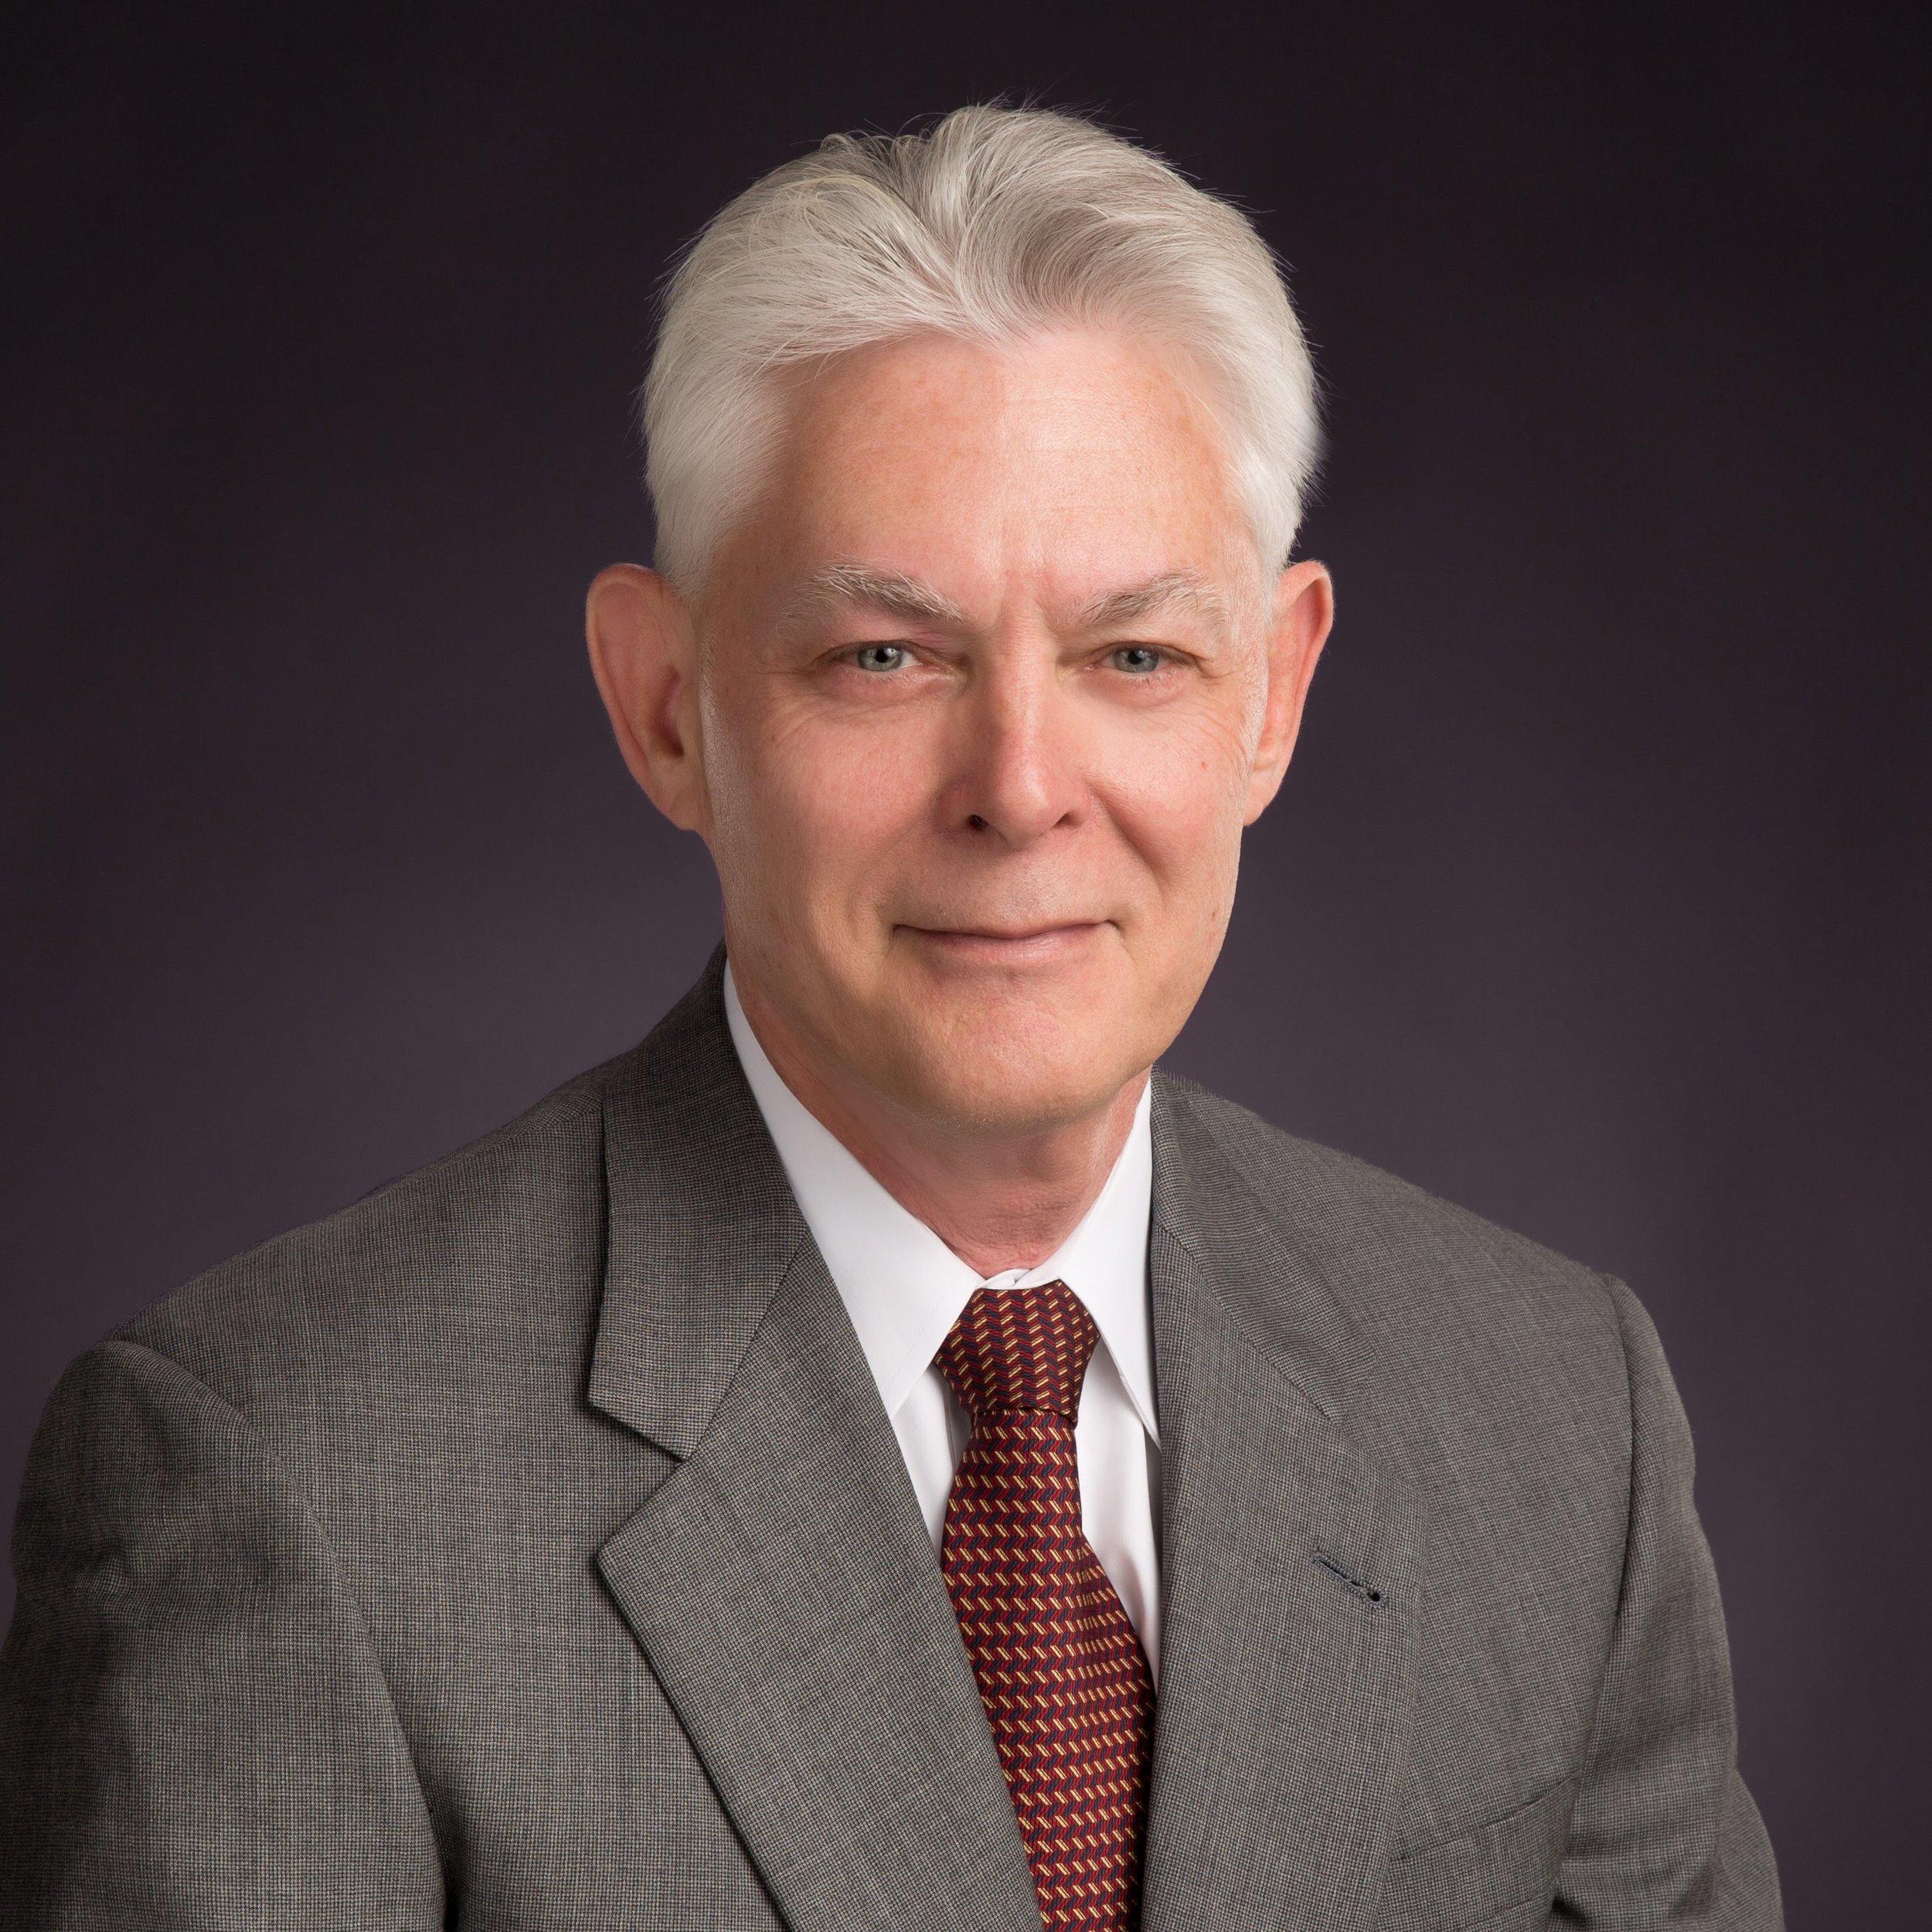 Terry M. McKenzie